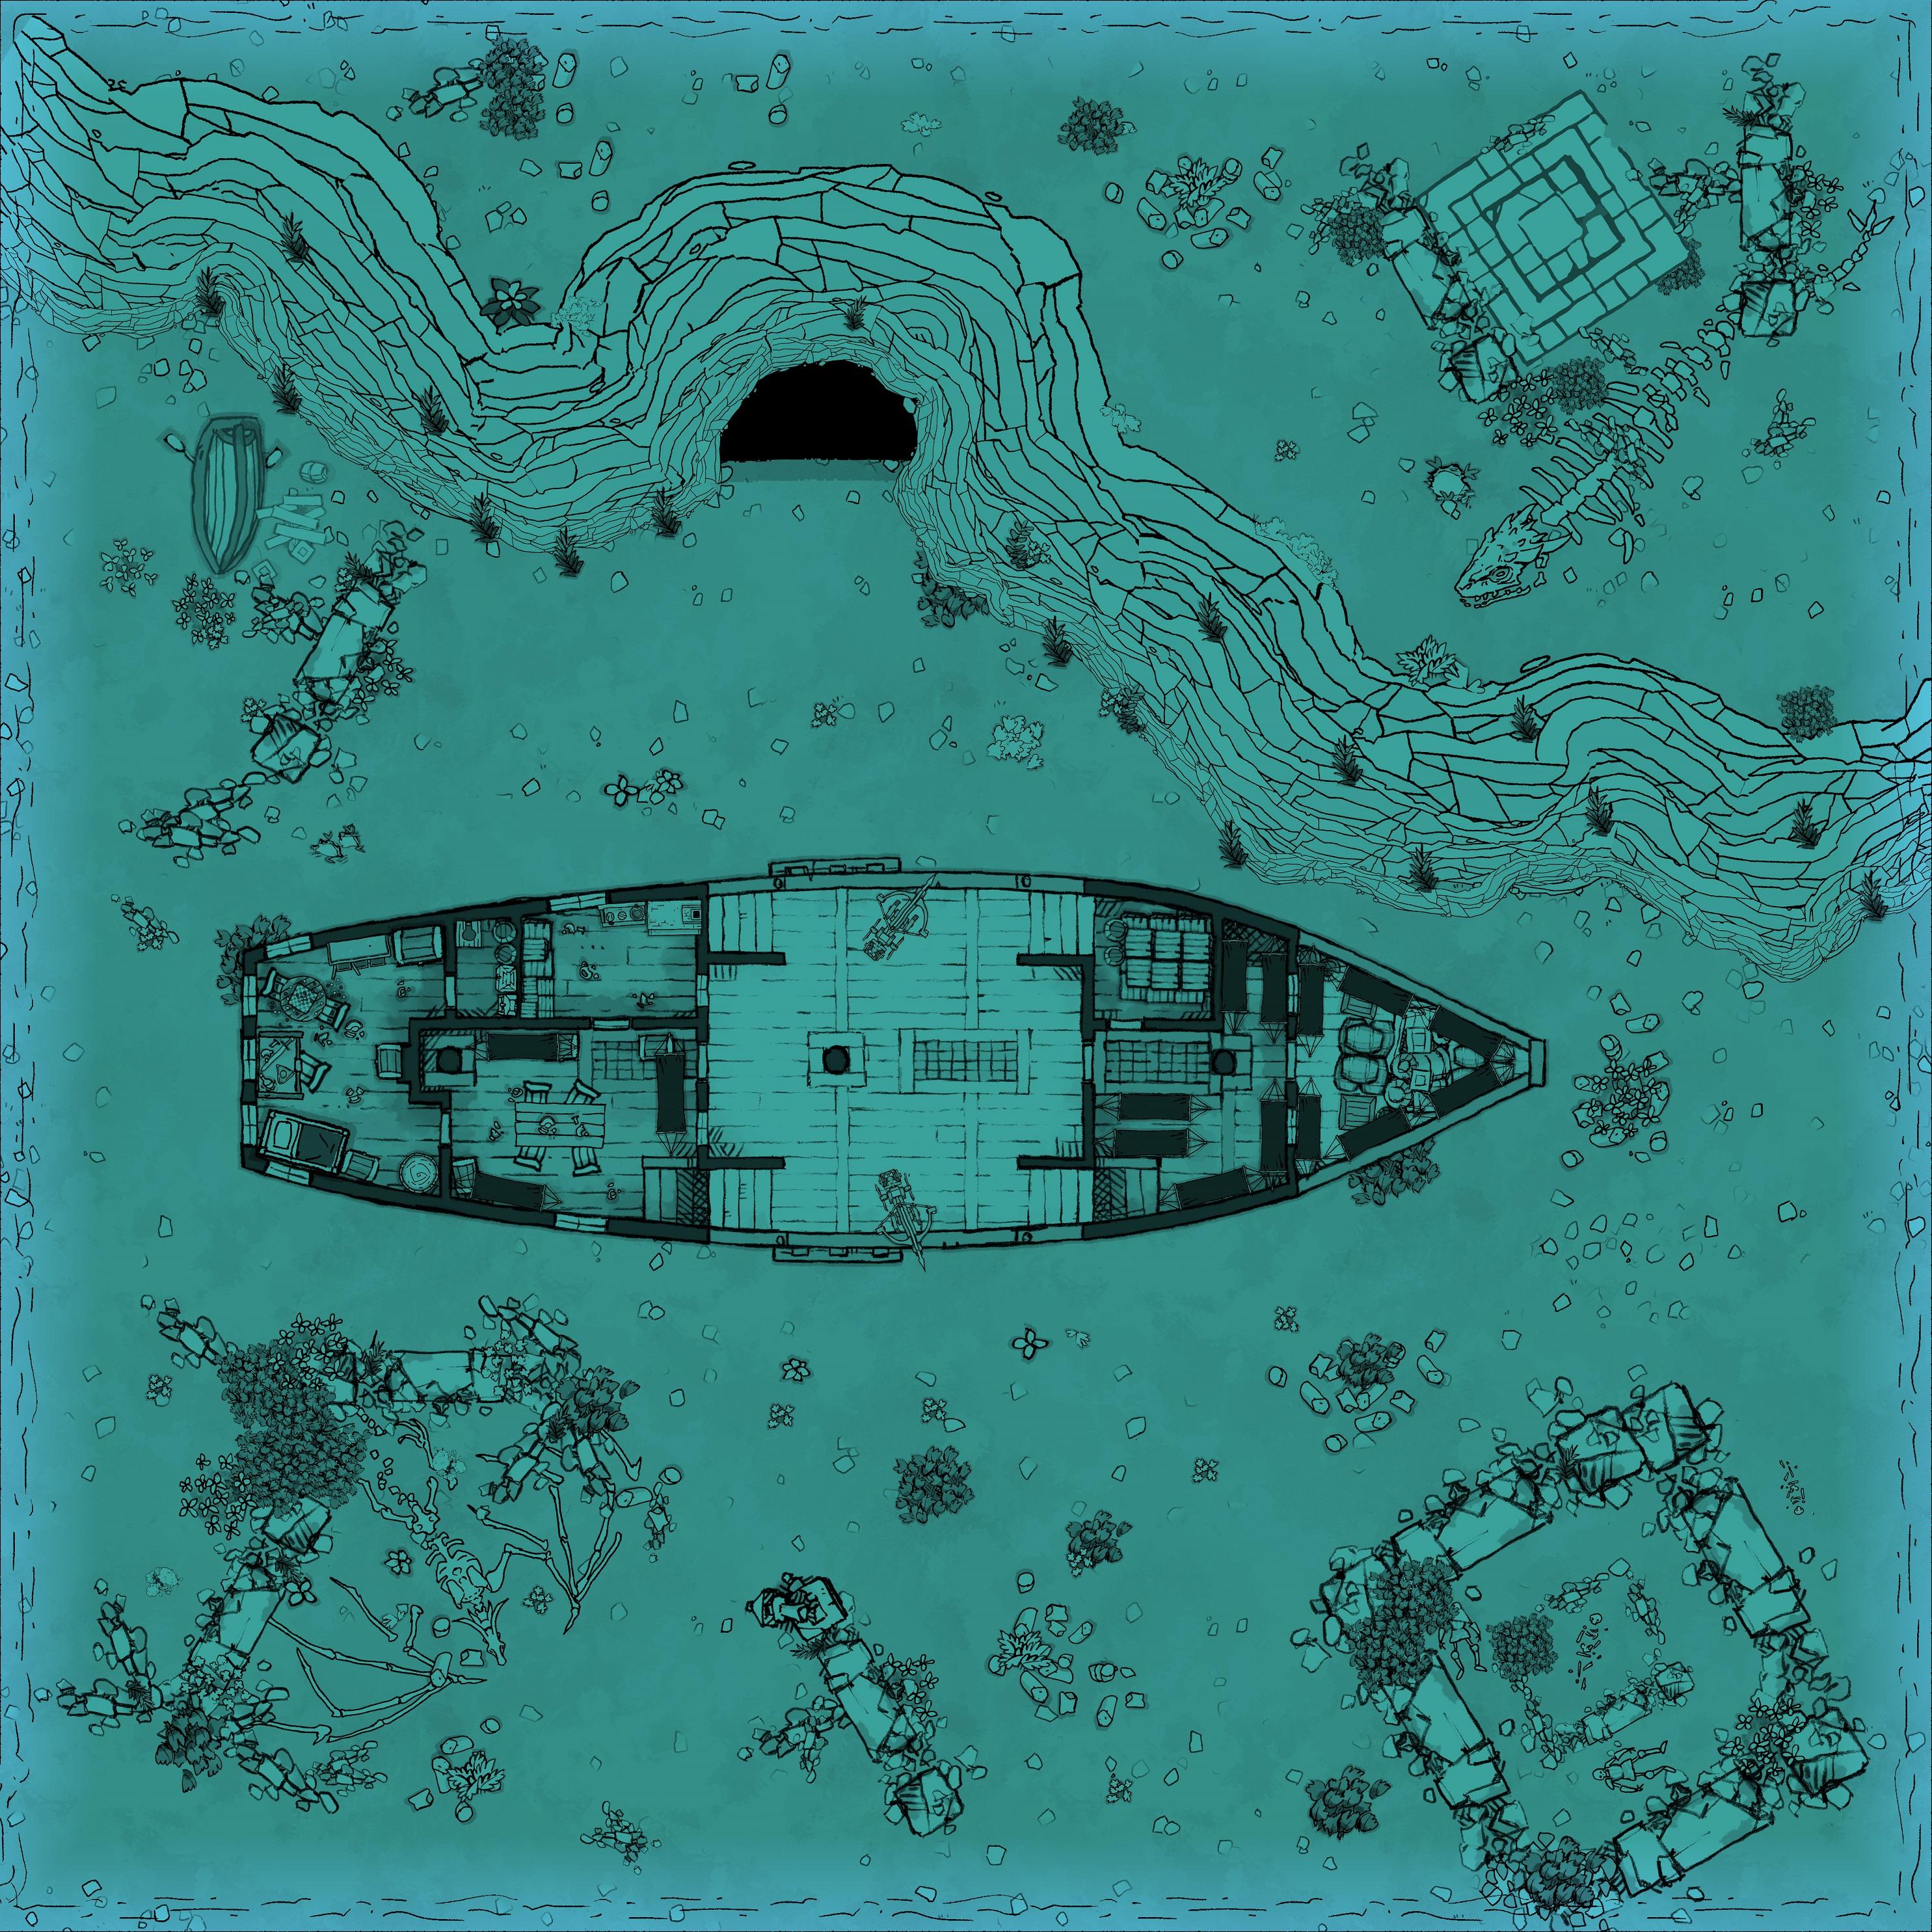 Sunken Shipwreck v2 no grid 30 x 30 reduced.jpg